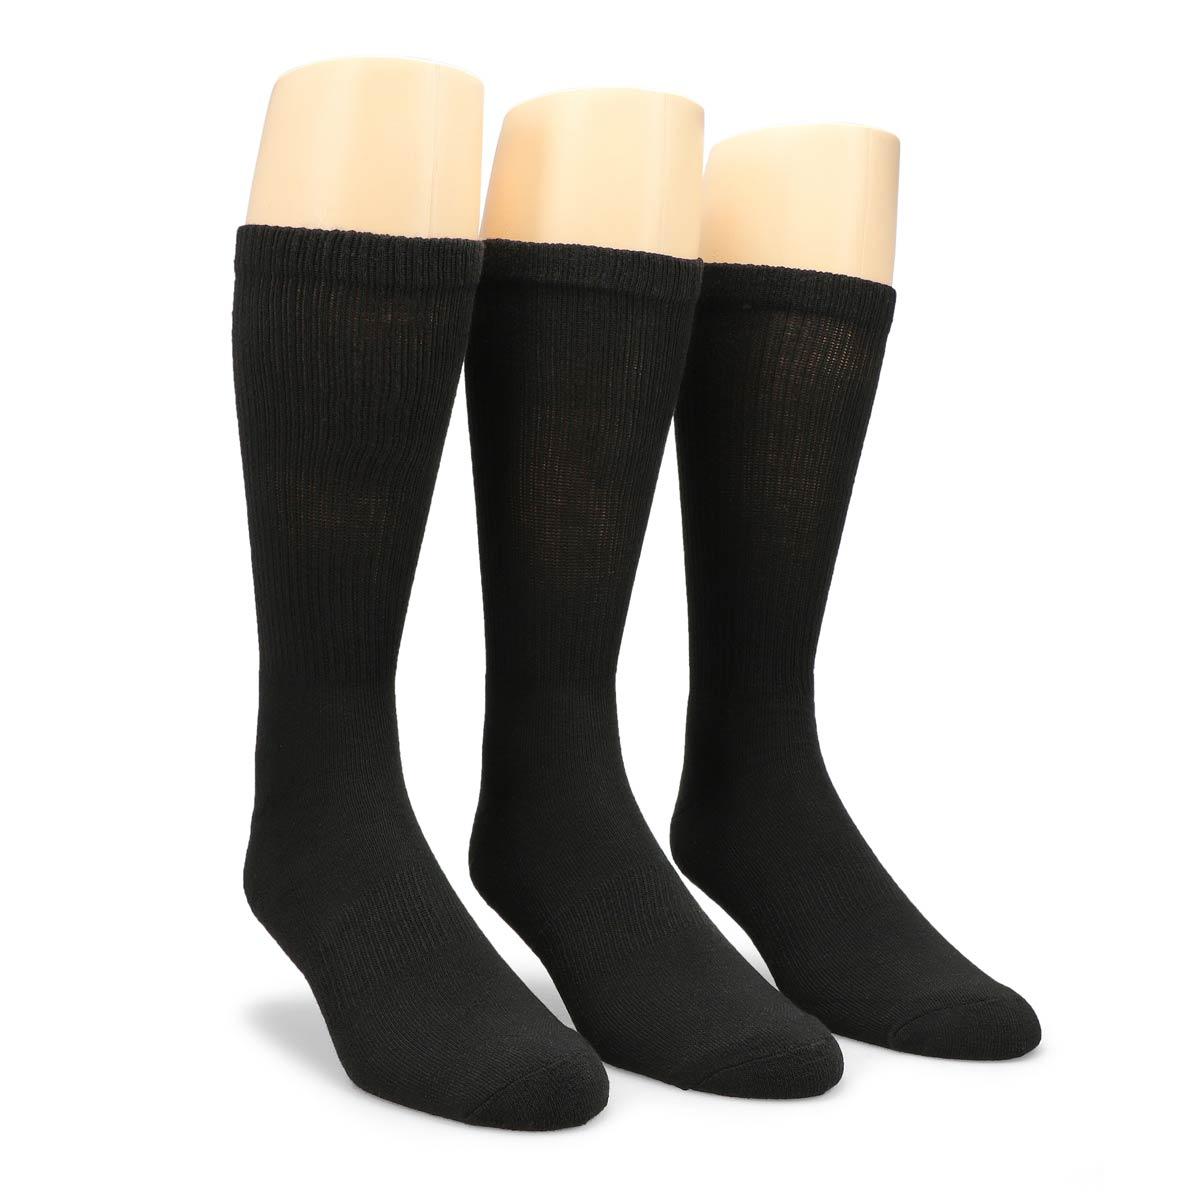 Men's Converse Half Cushion Crew Sock - Black